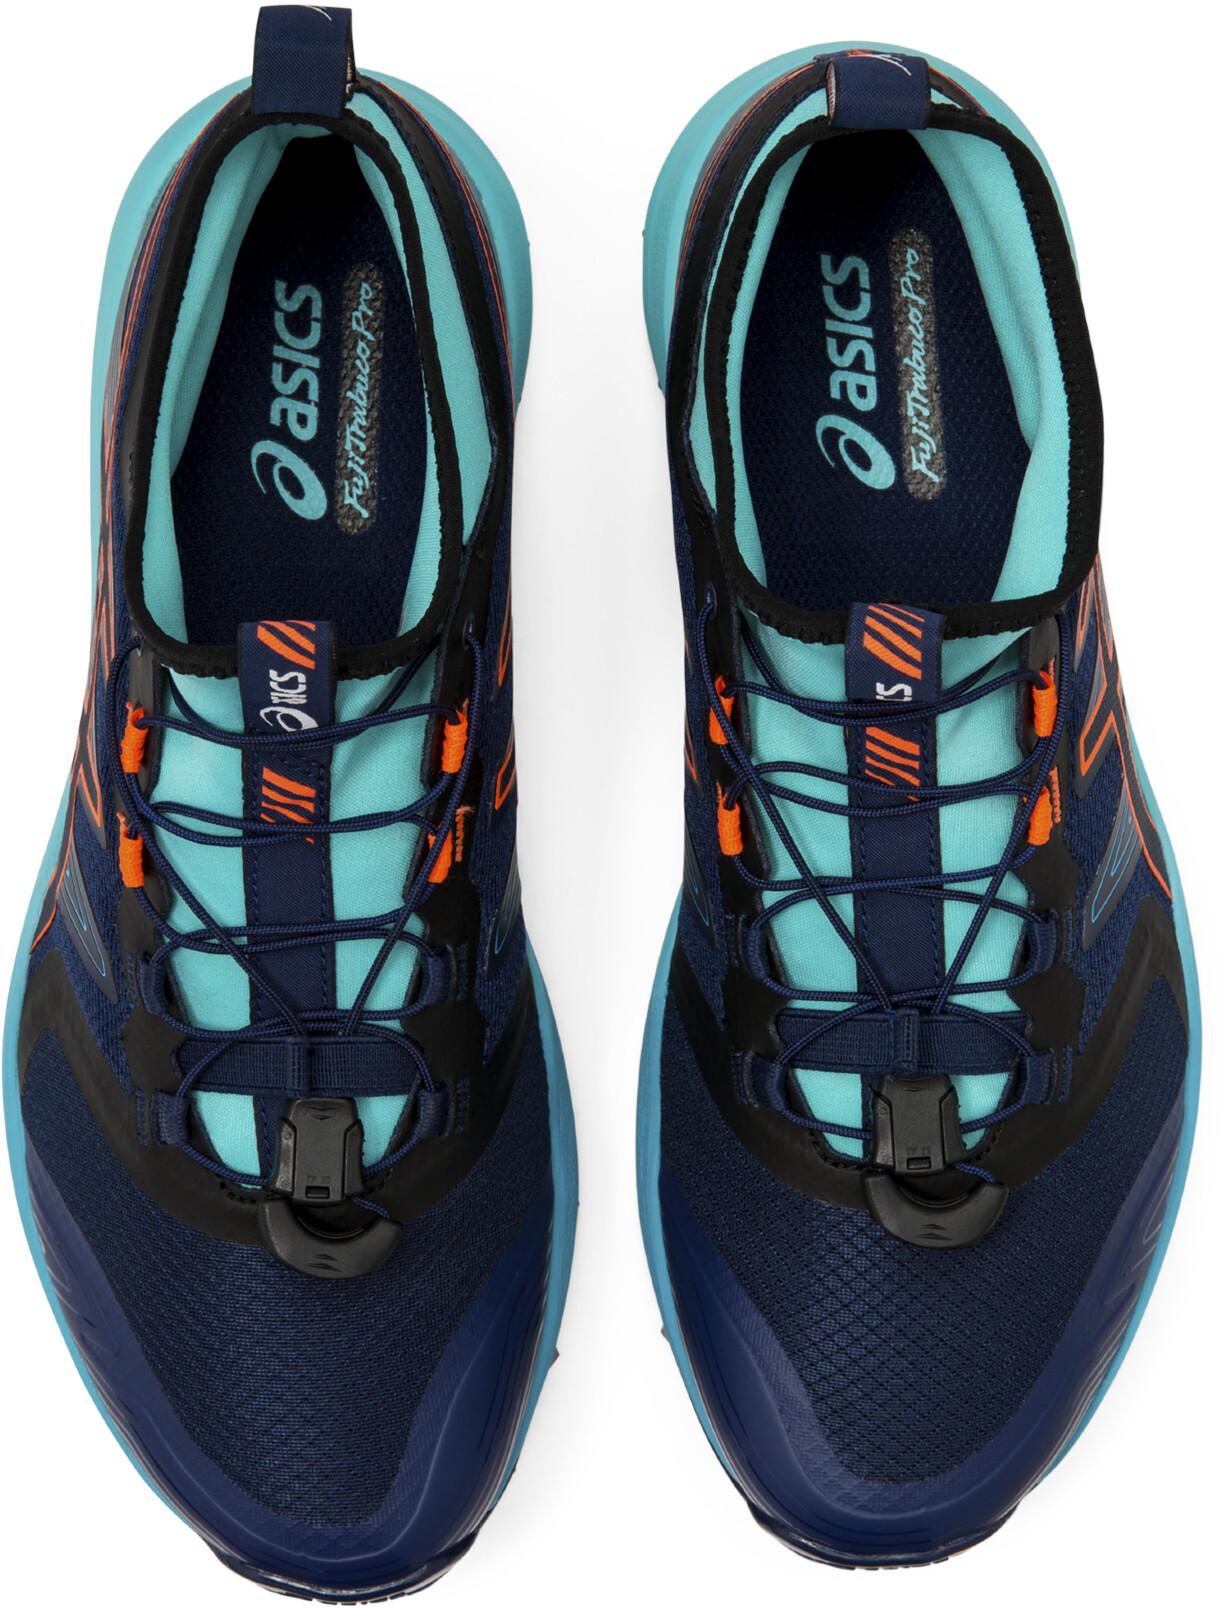 asics FujiTrabuco Pro Shoes Women, blue expanseblue expanse